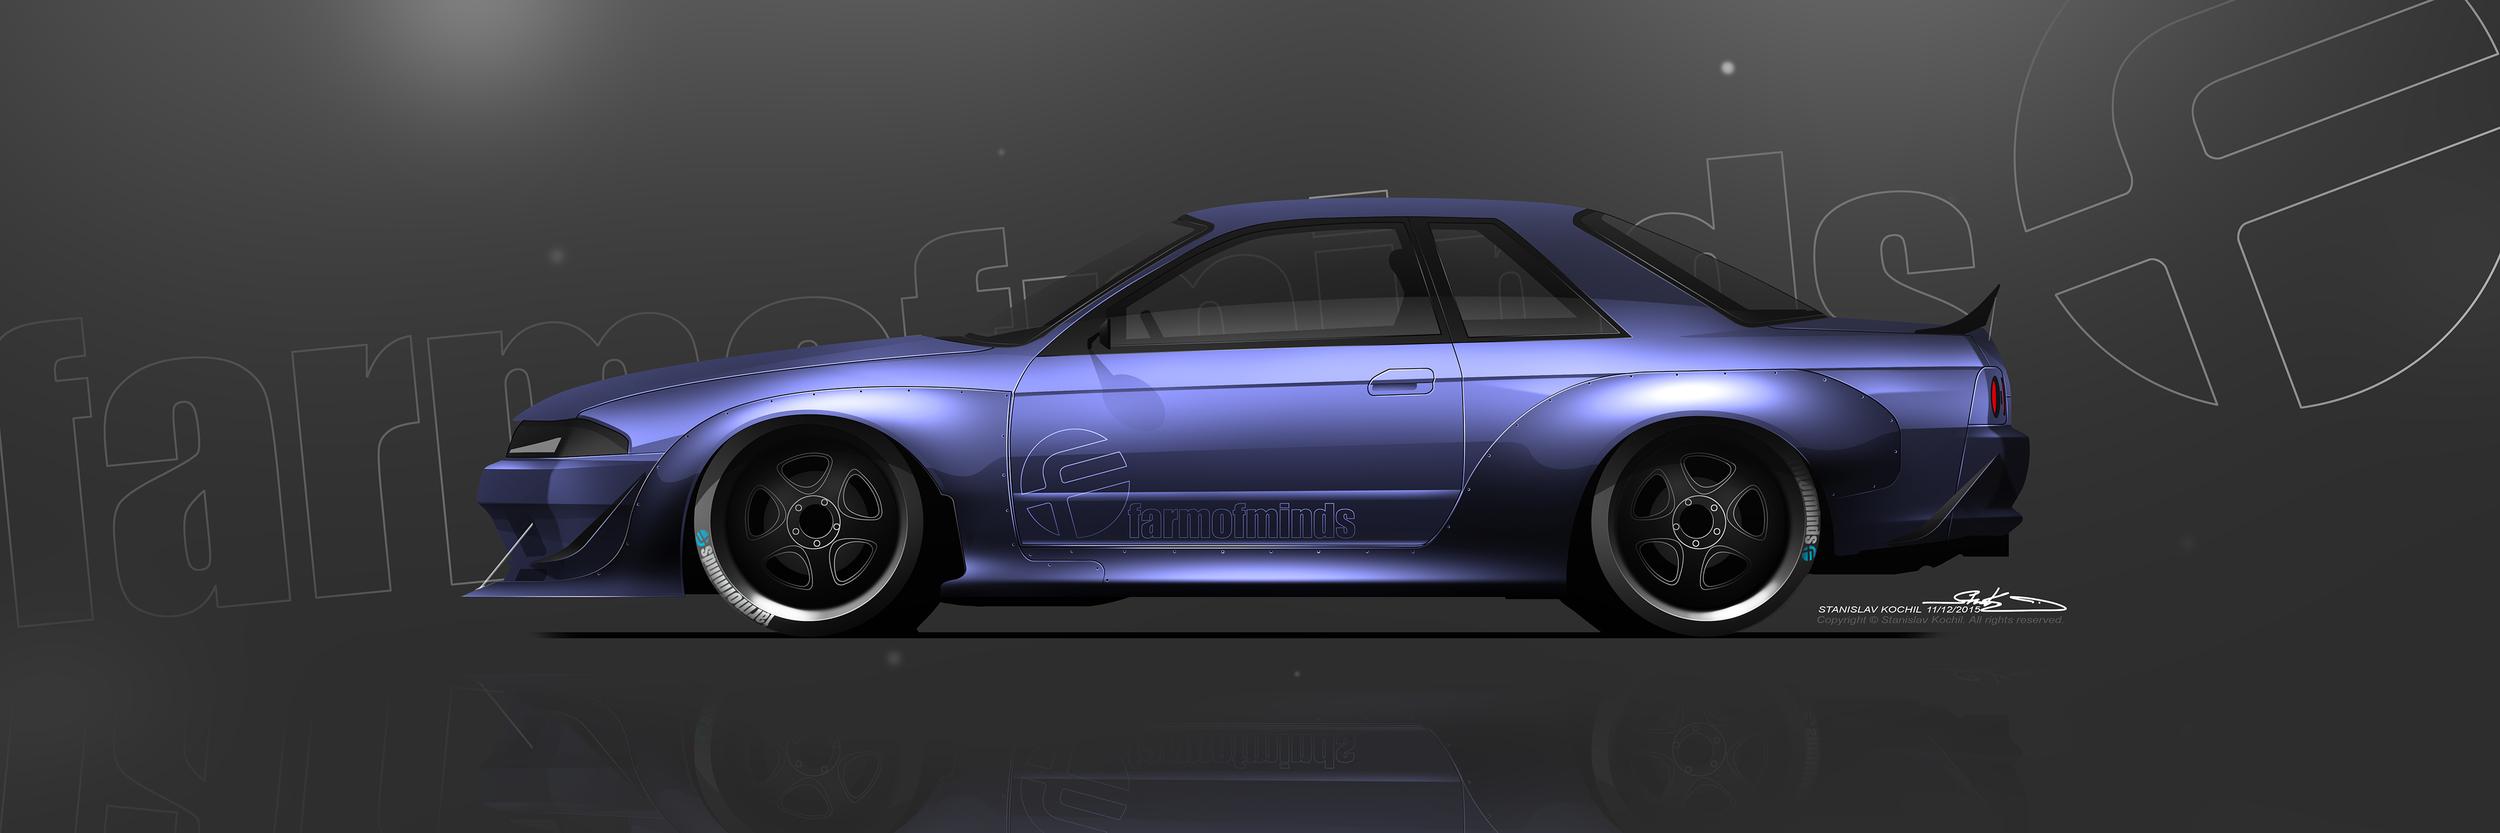 FOM R32 GTR Wide Body, Vision.